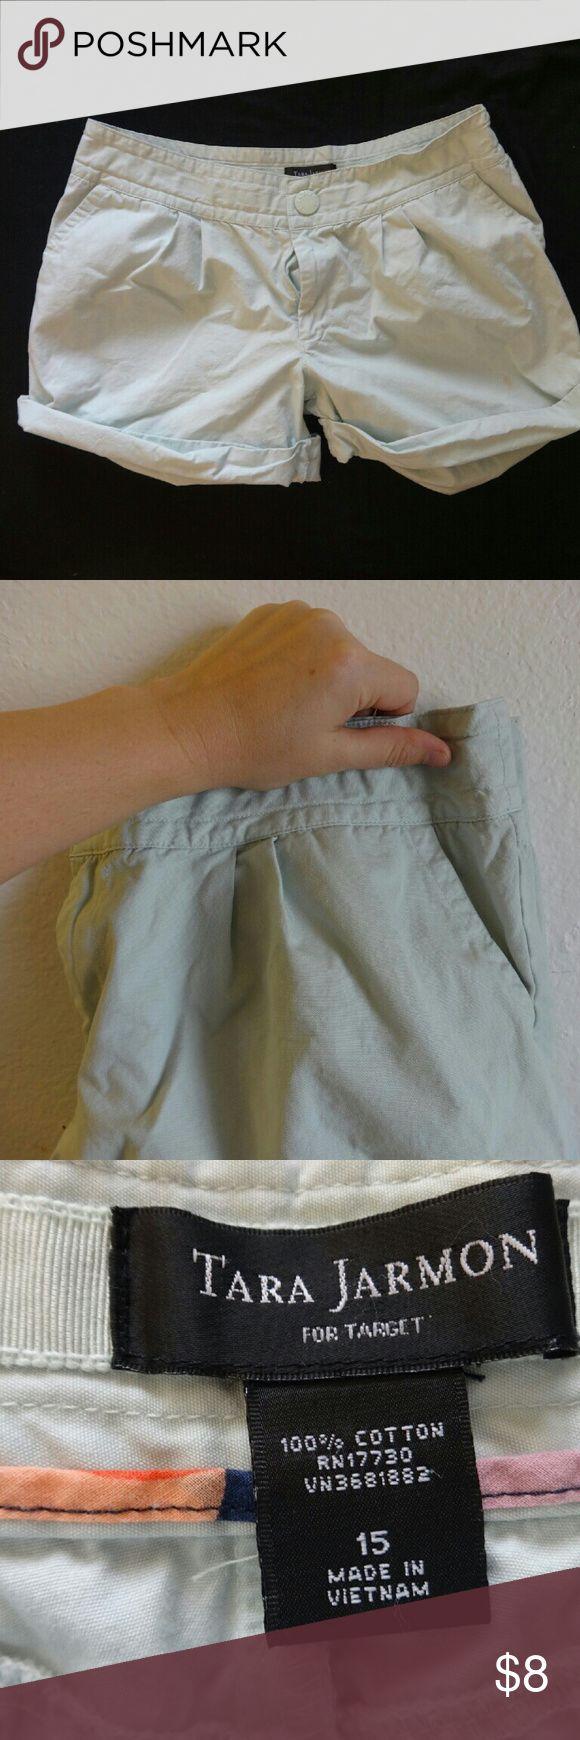 Tara Jarmon Mint Shorts Small yellow stain on one leg. Very cute mint cuffed shorts. Tara Jarmon Shorts